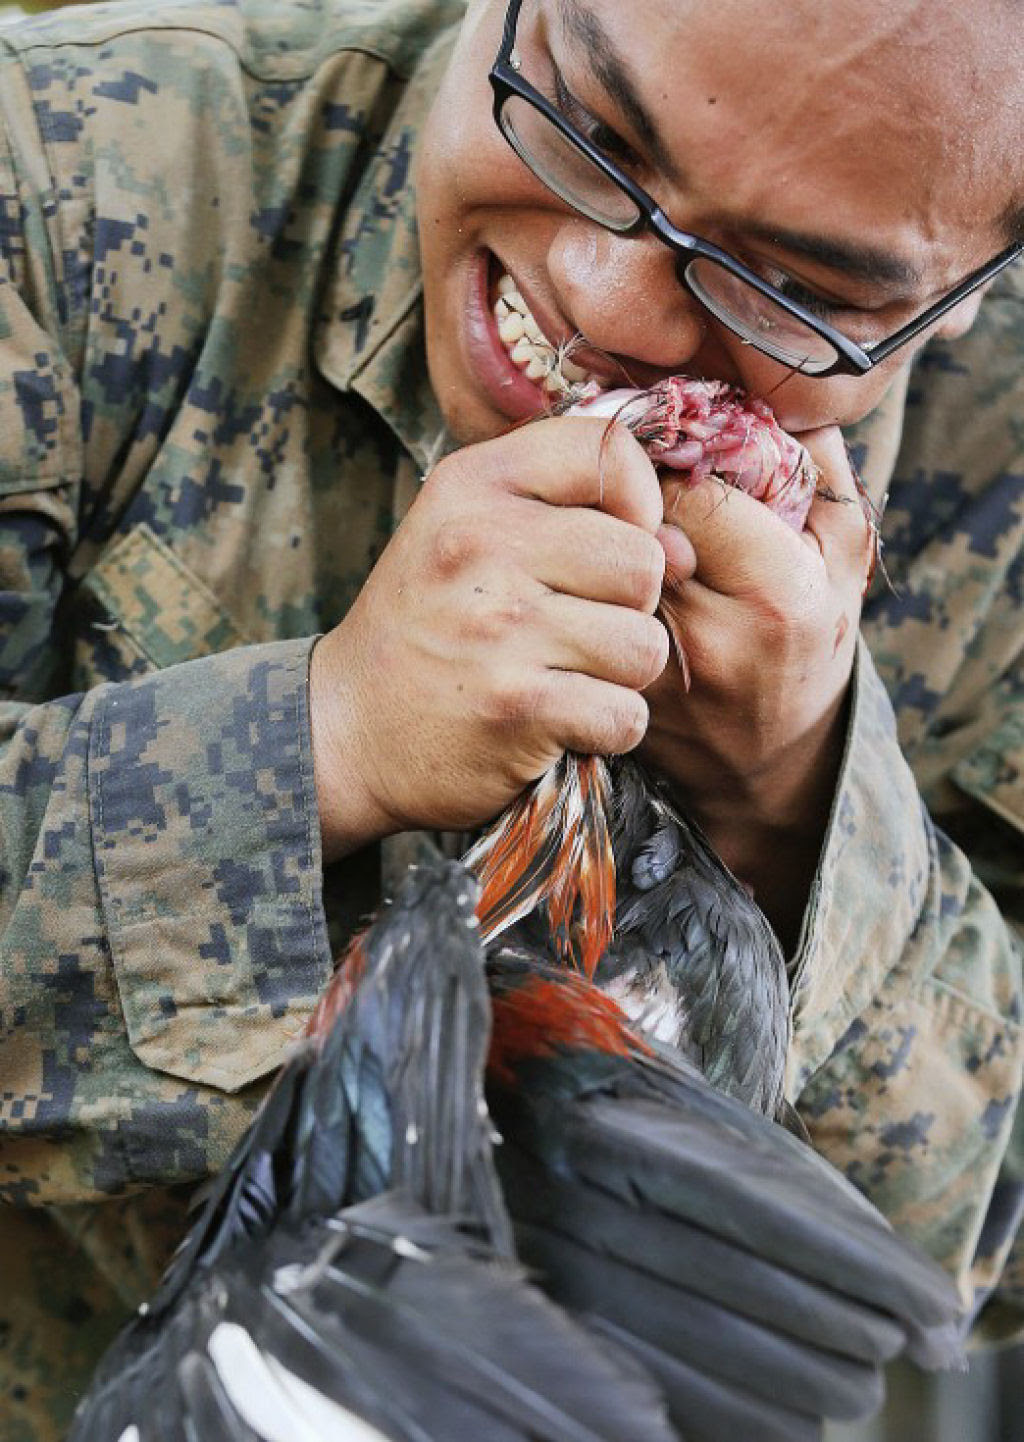 Cobra Gold 2013 - Militares sobrevivem com sangue de cobra na selva tailandesa 13